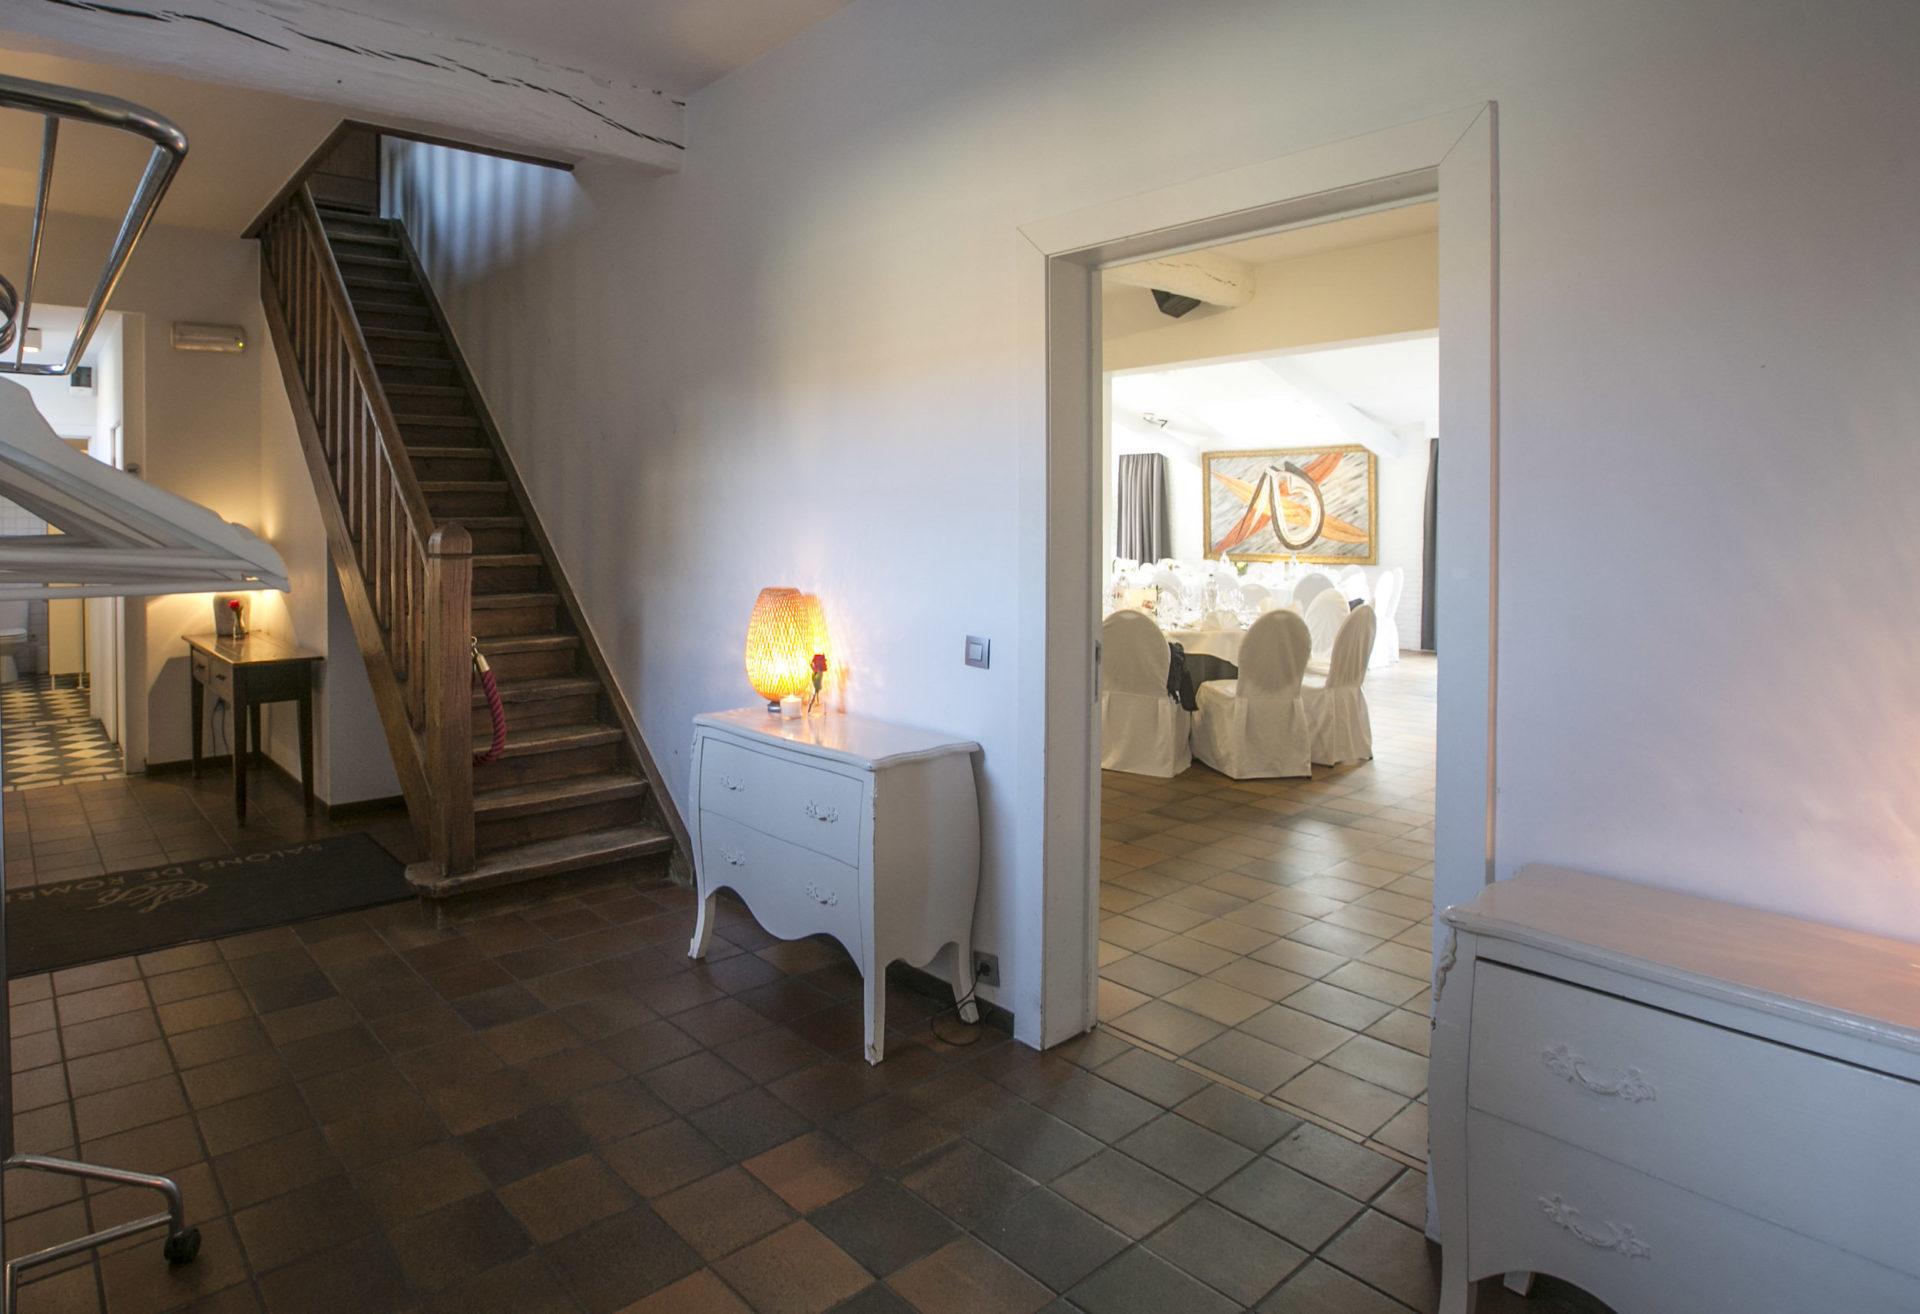 Fireplace - Salons de Romree